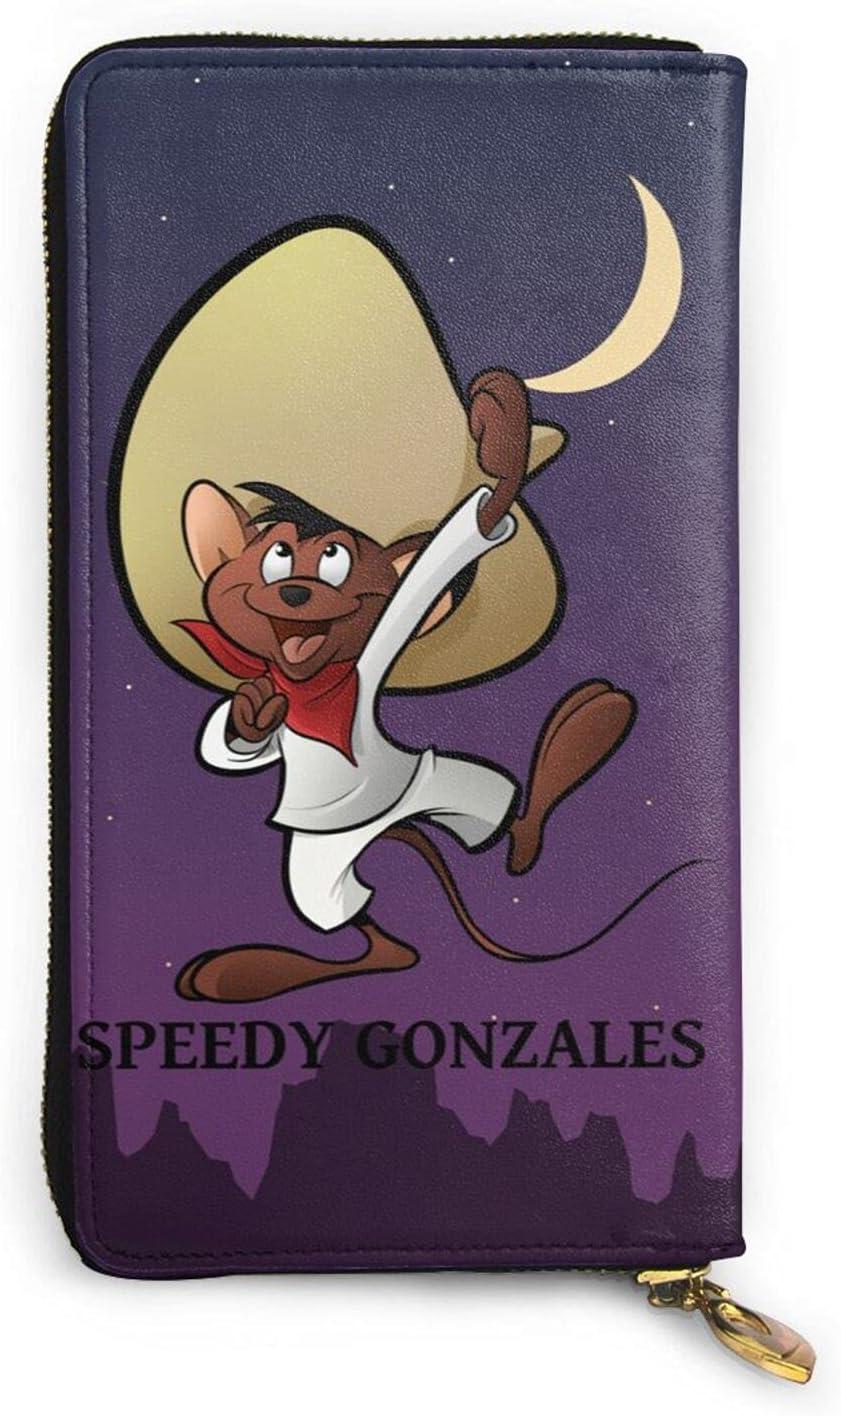 Speedy Gonzales Coin Max 83% OFF Purse Rare Zipper Popular Wallet Cartoon Classic